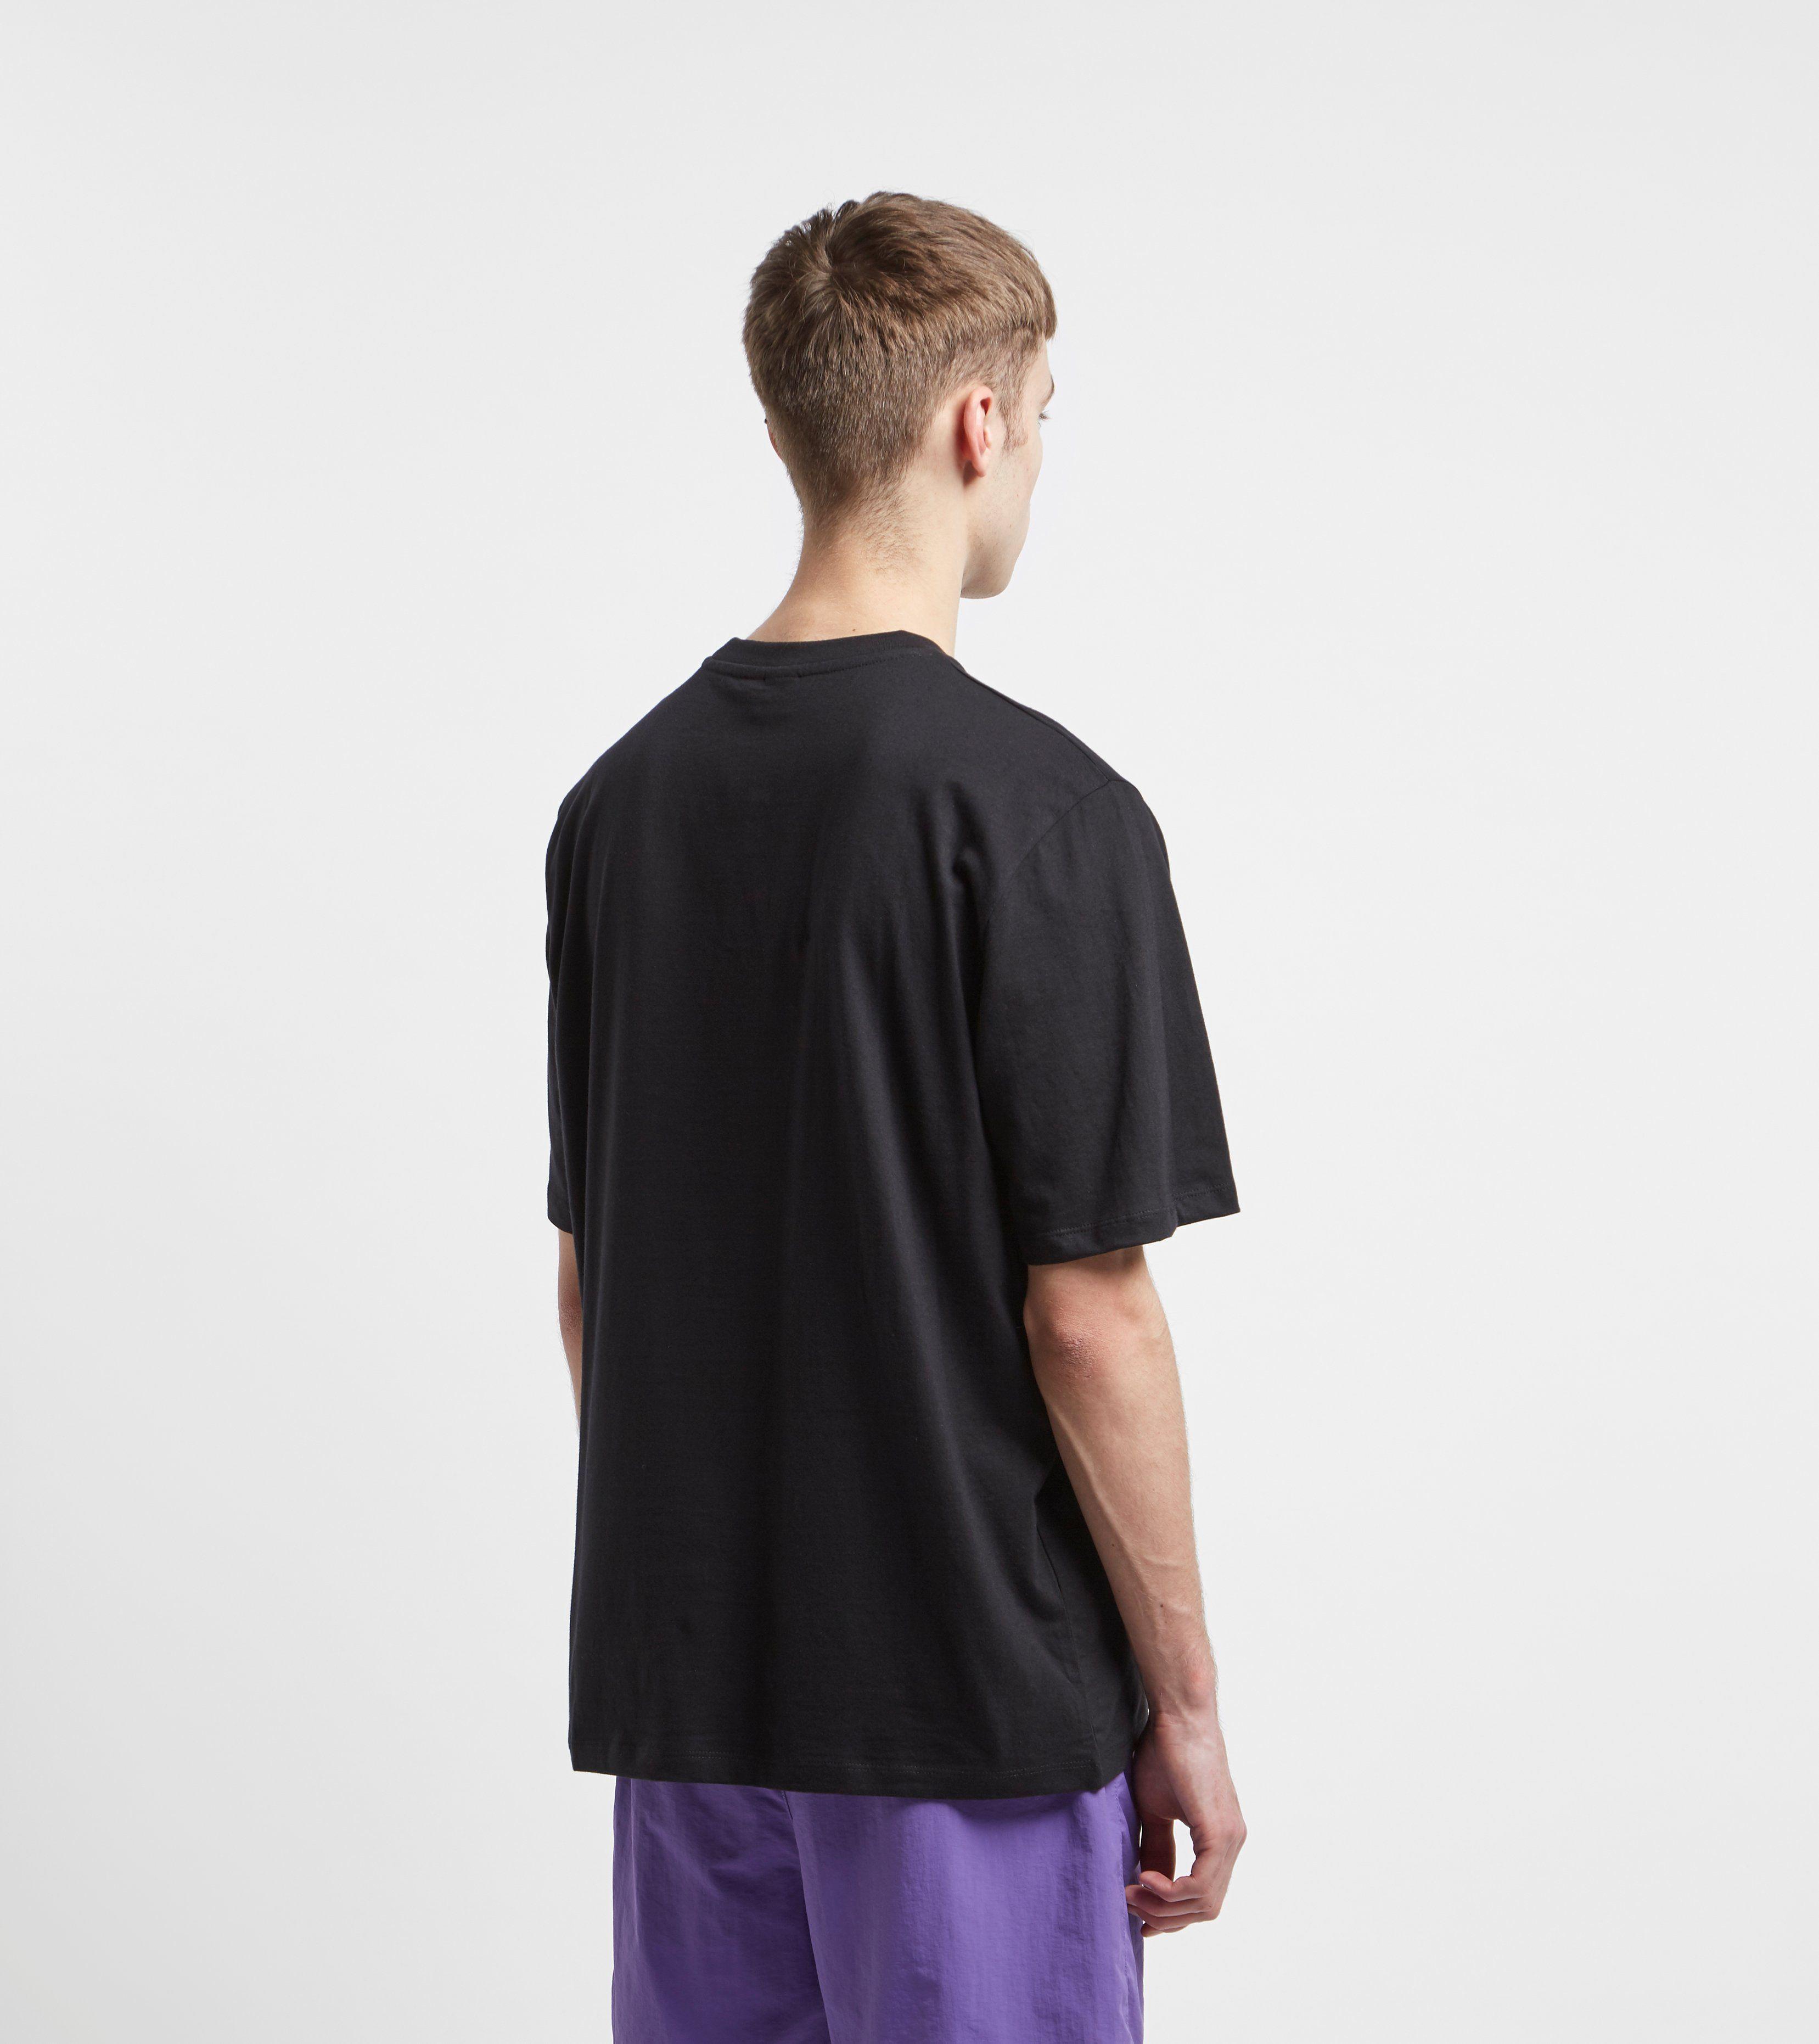 Sergio Tacchini Illie SS T-Shirt